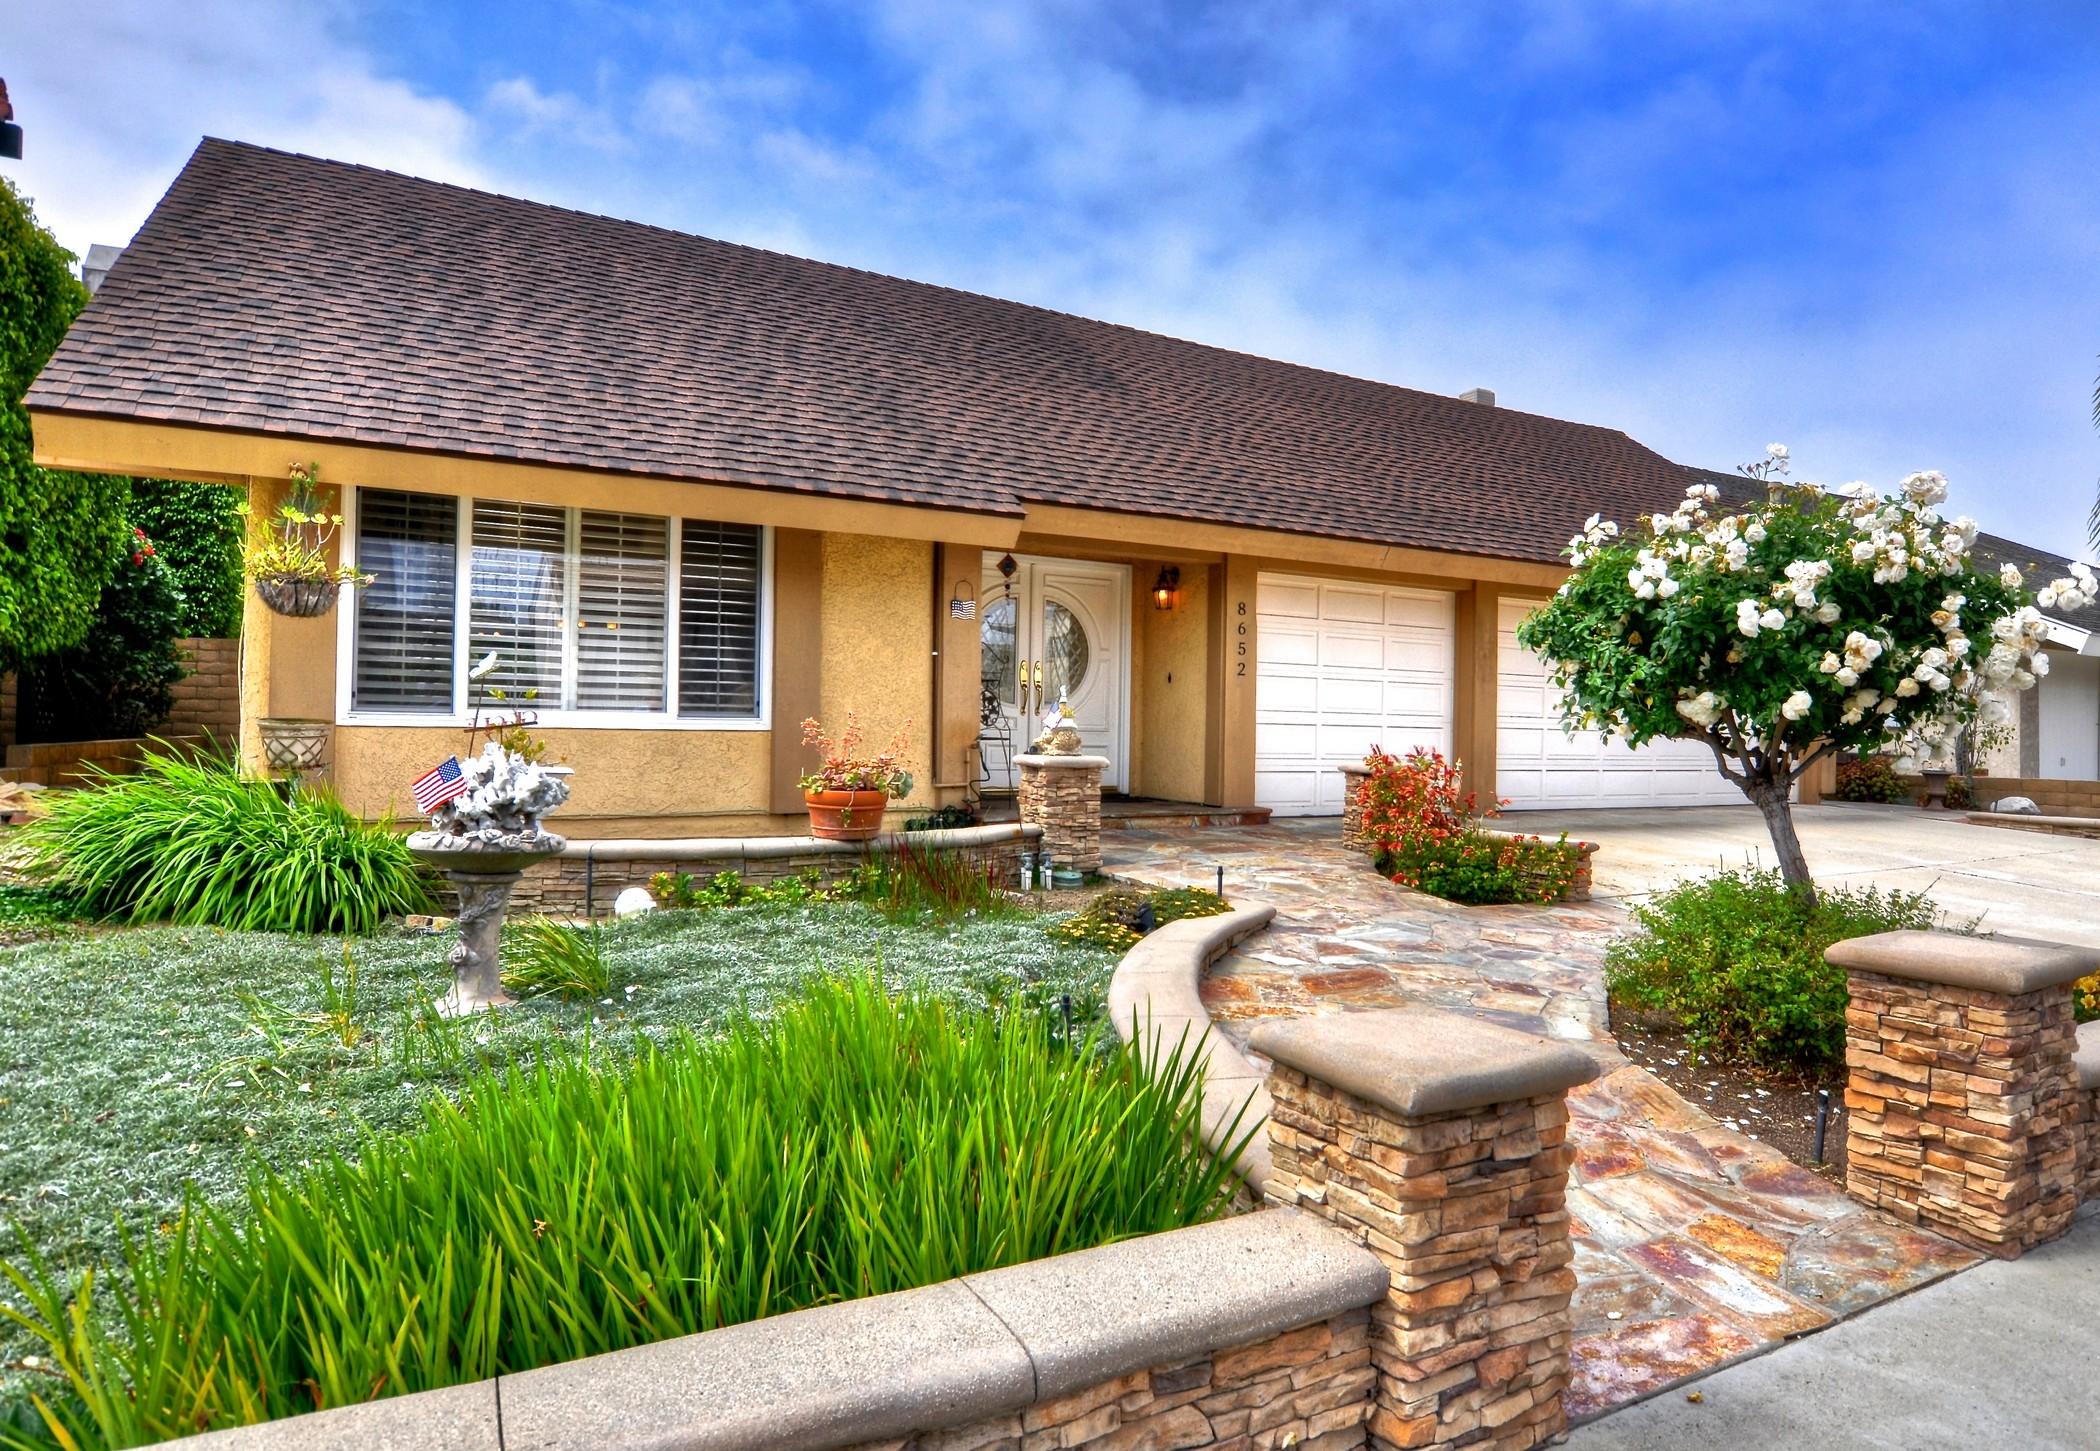 Single Family Home for Sale at 8652 Lorraine Drive Huntington Beach, California, 92646 United States